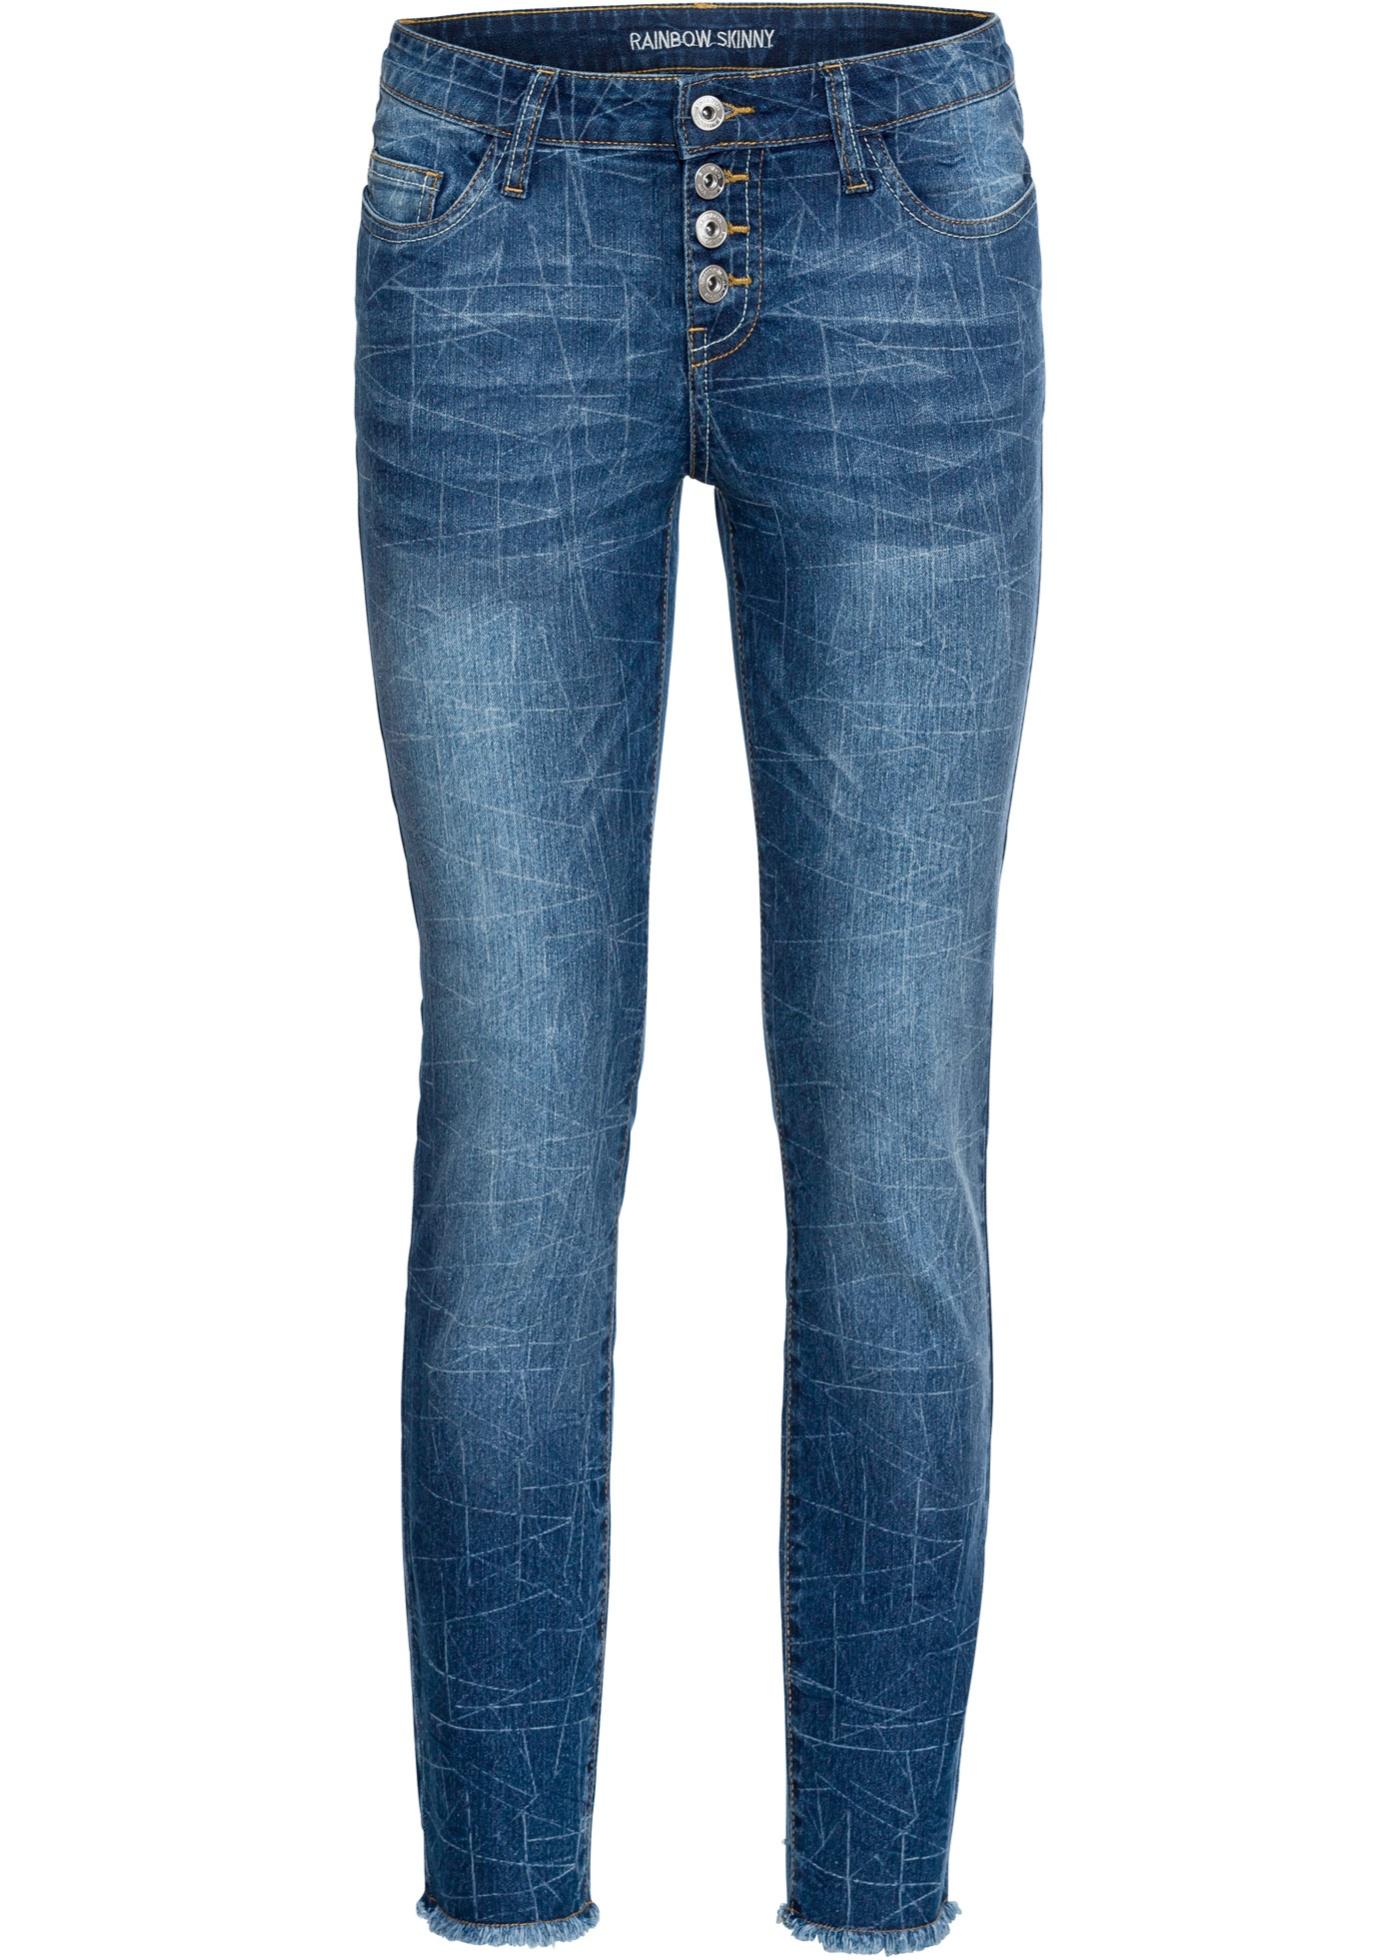 Bonprix - Skinny jeans med geometrisk tv?¤ttad effekt 379.00